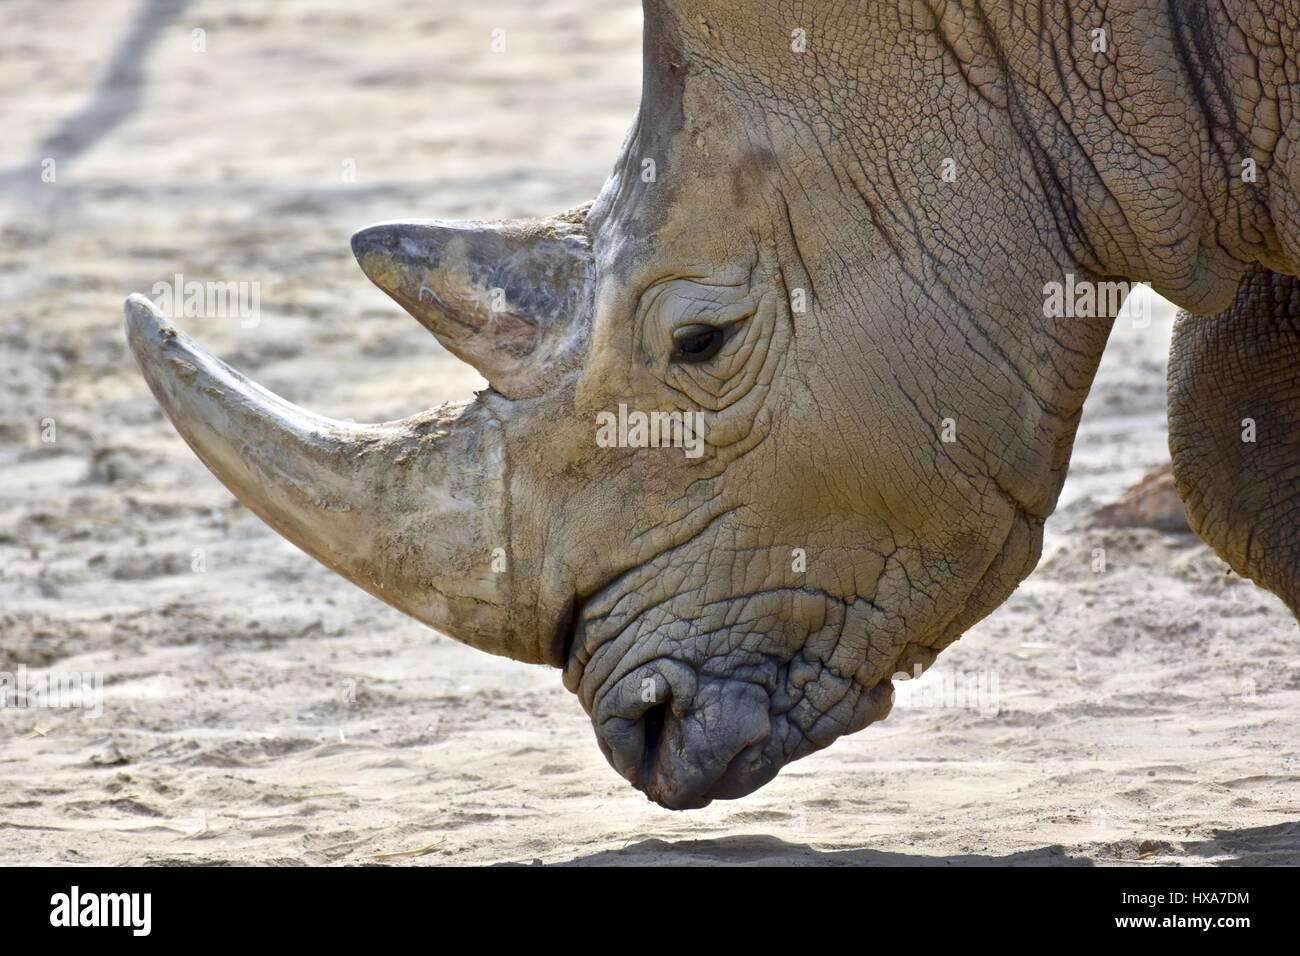 Southern White Rhino (Ceratotherium simum simum) - Stock Image